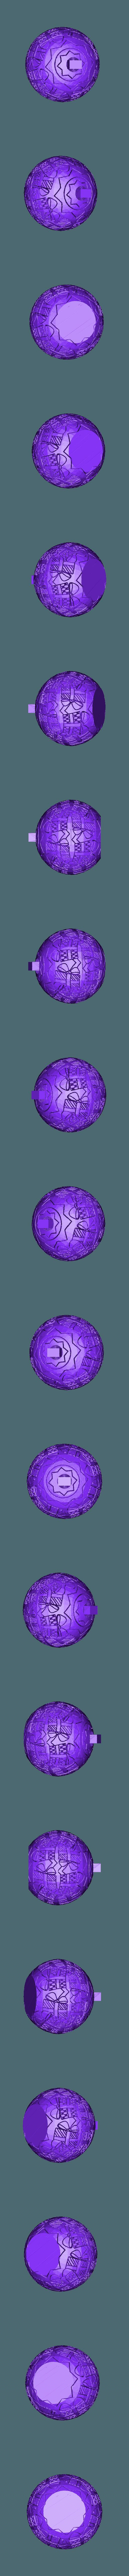 boule de noel 2.stl Download free STL file christmas ball 2 • Object to 3D print, Motek3D